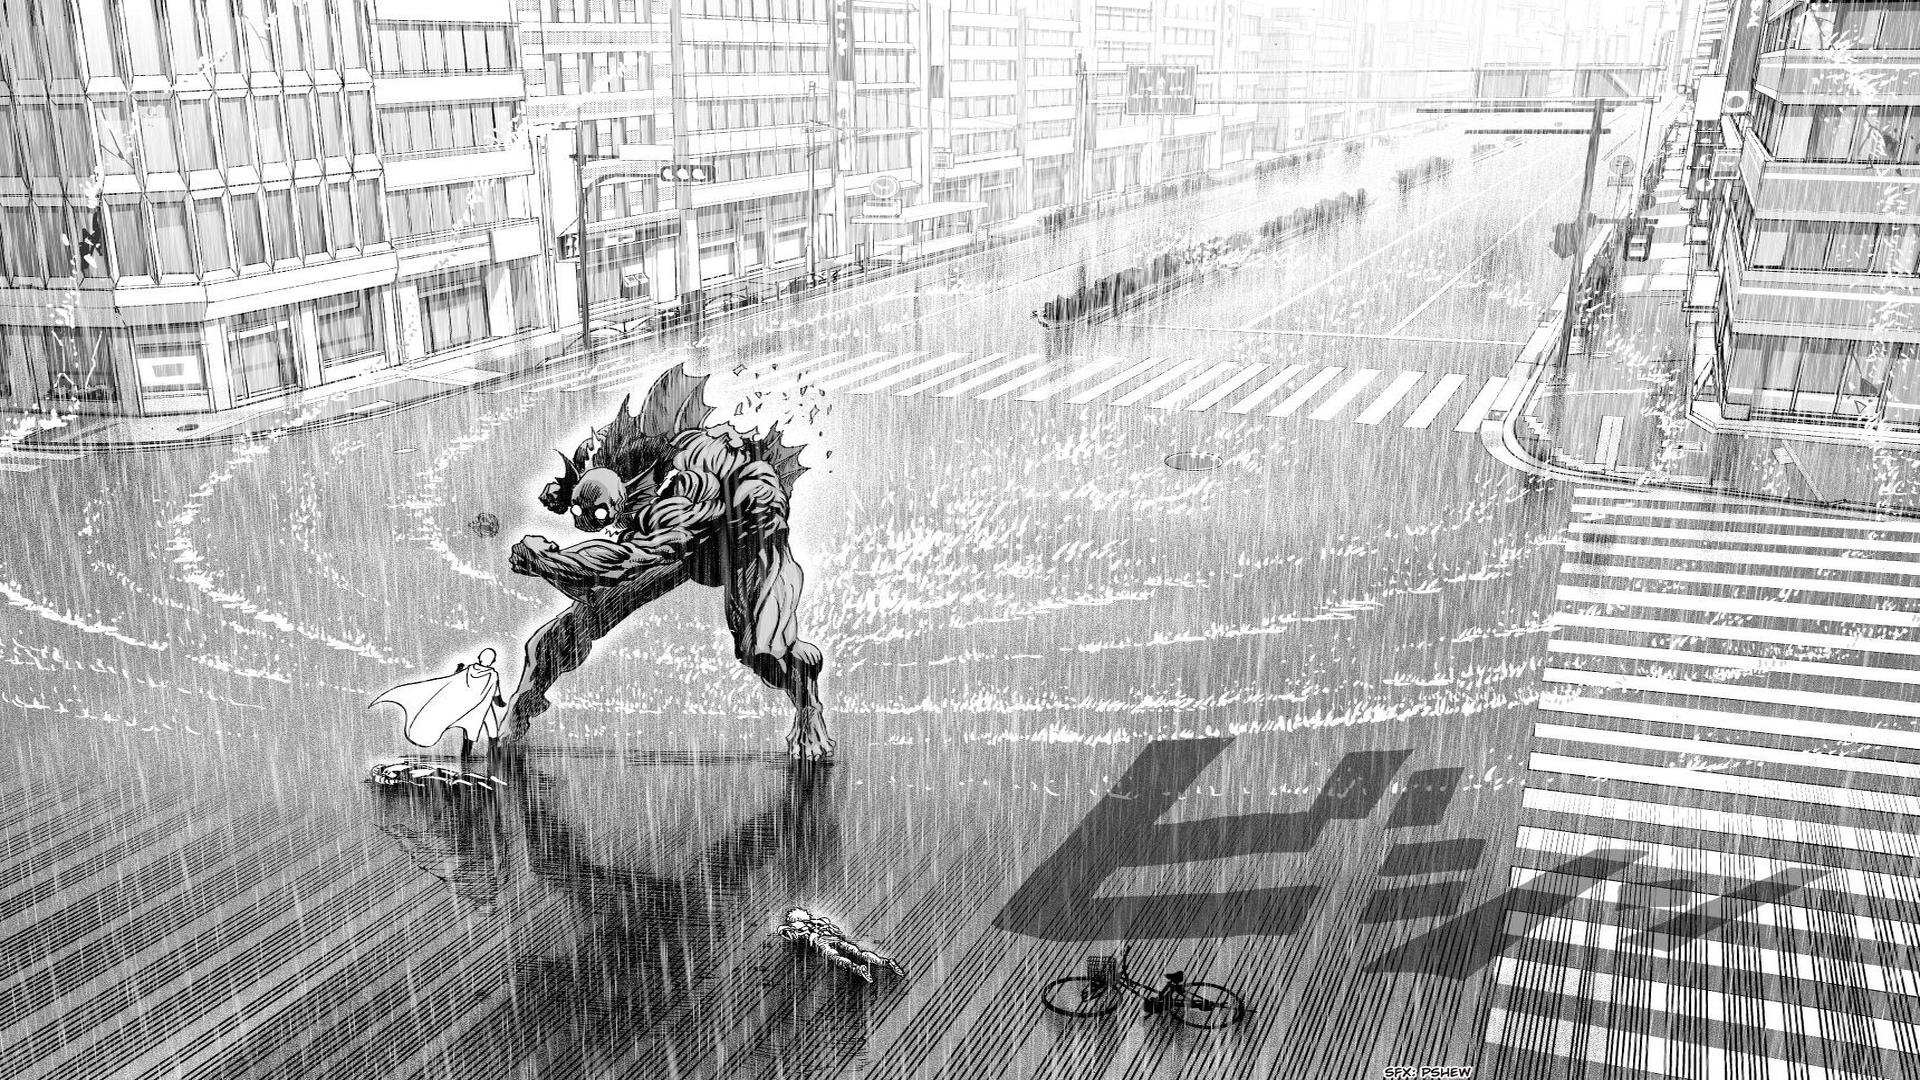 Anime 1920x1080 One-Punch Man manga anime monochrome